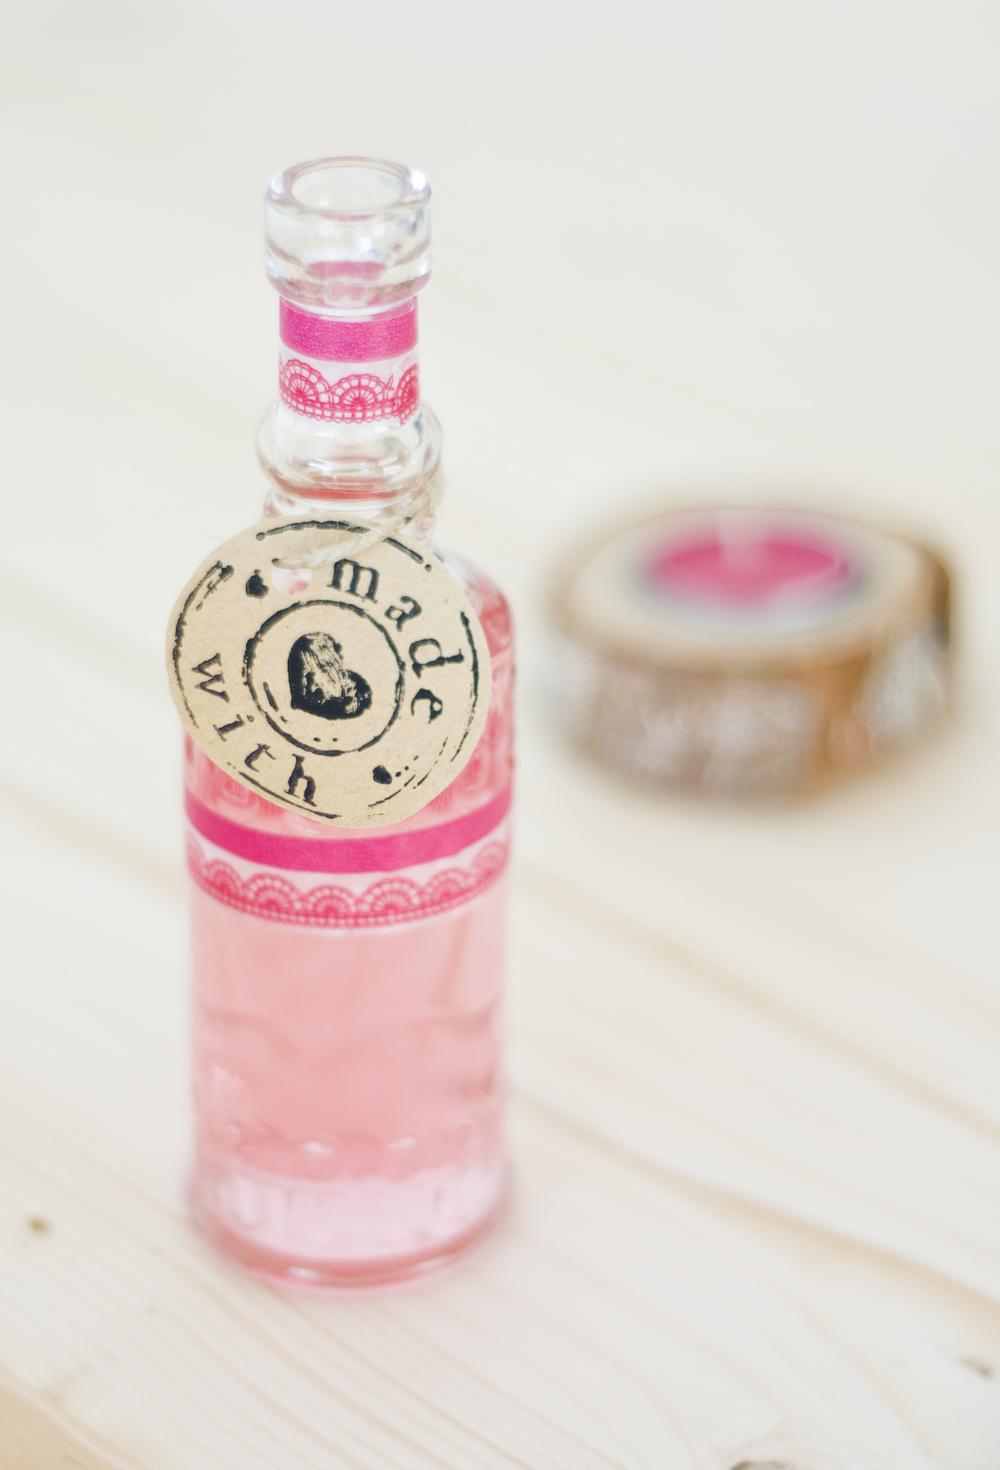 pinkfarbene Limonade